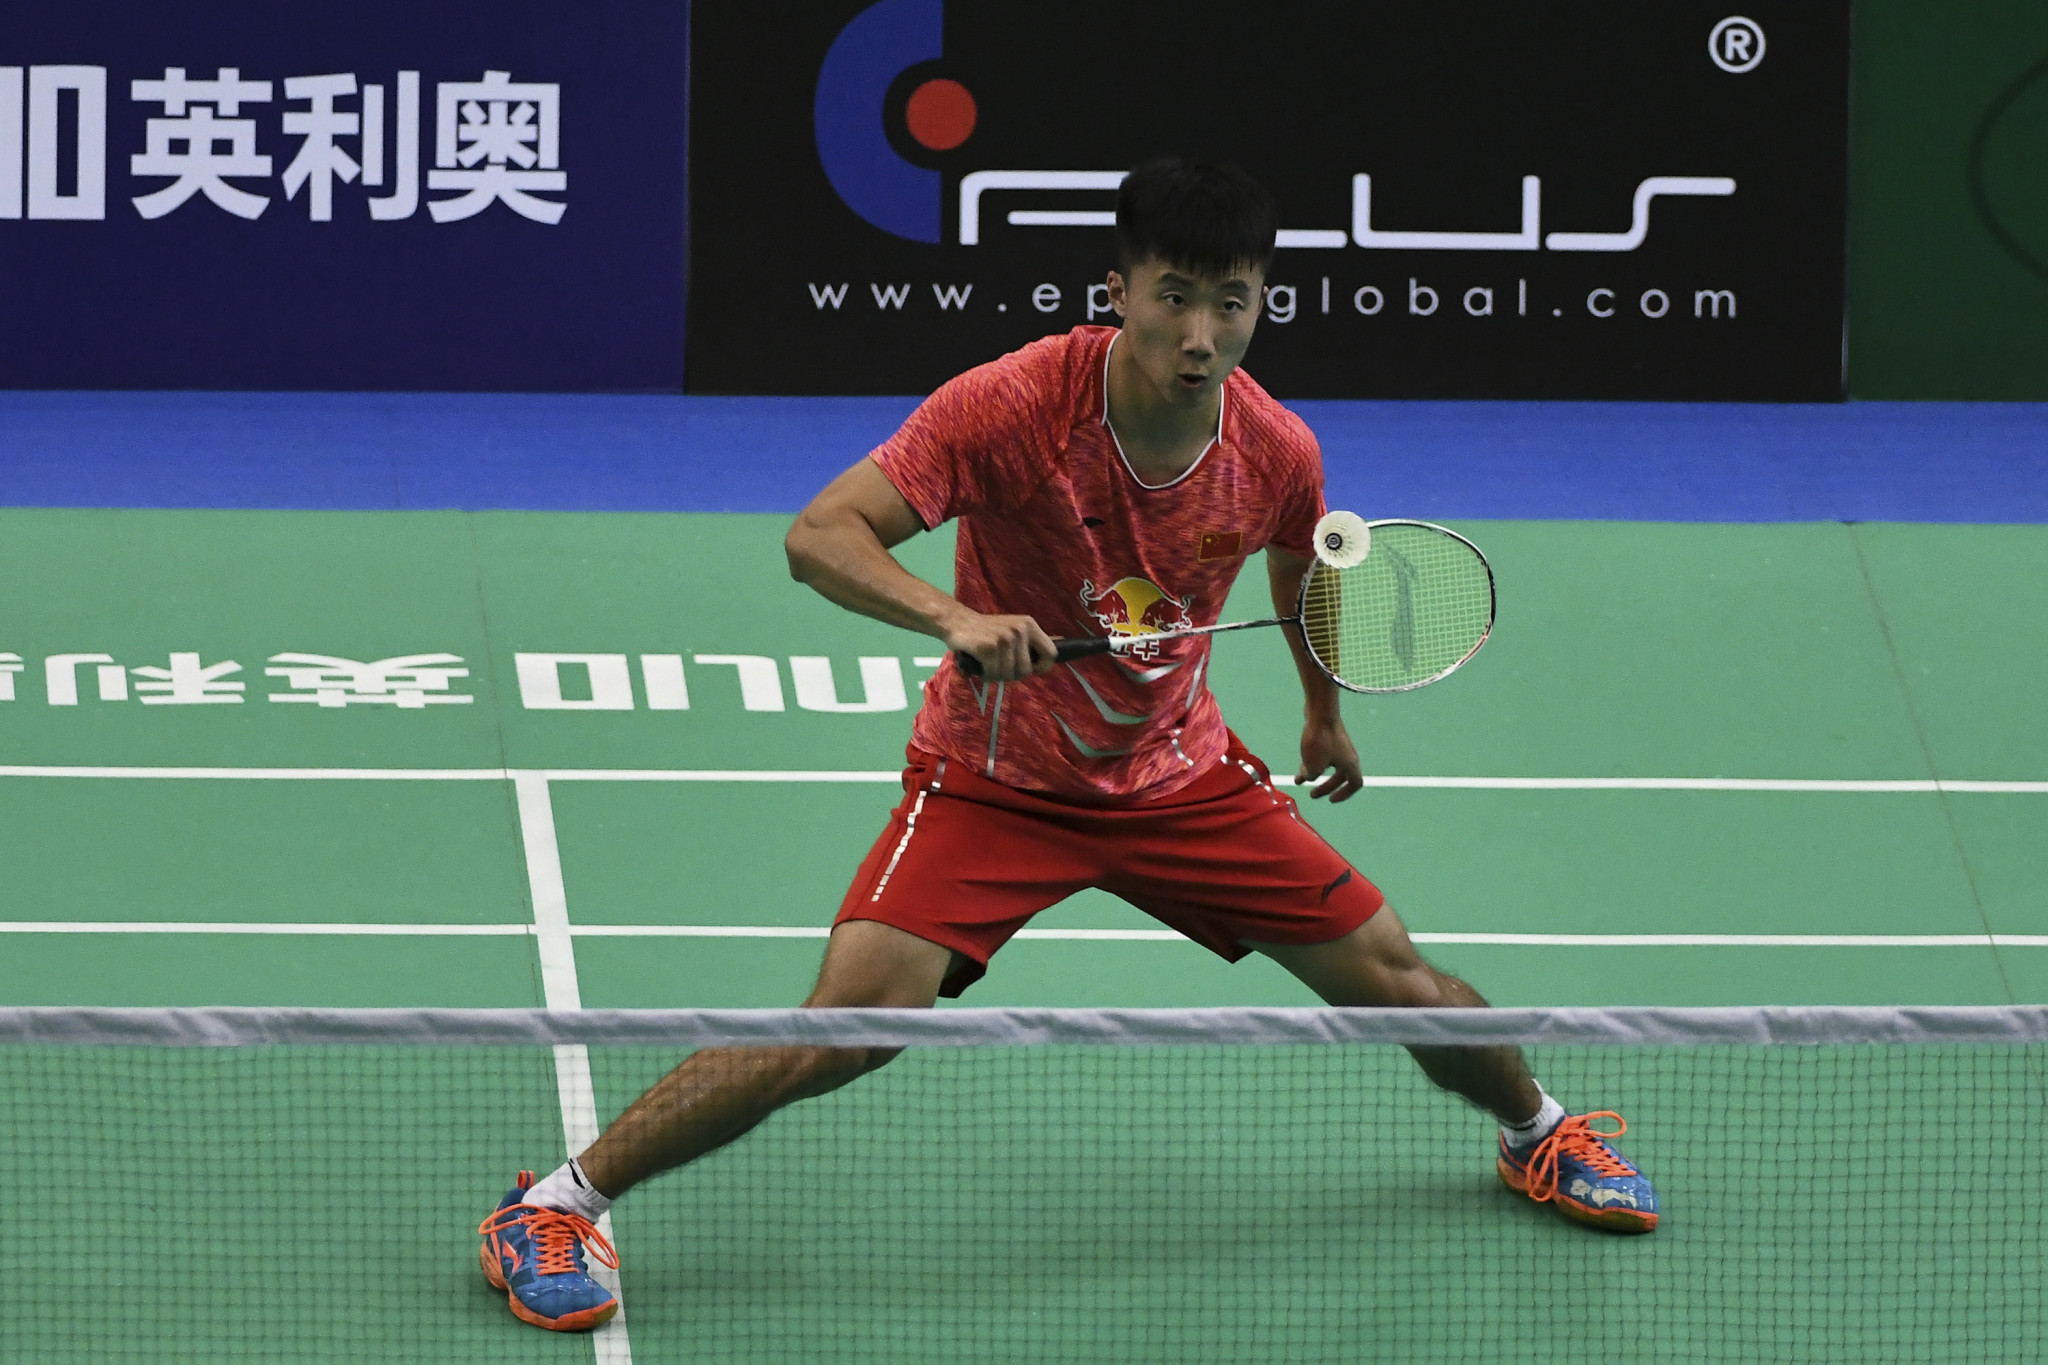 Chinese players enjoy quarter-final success at Syed Modi International Badminton Championships